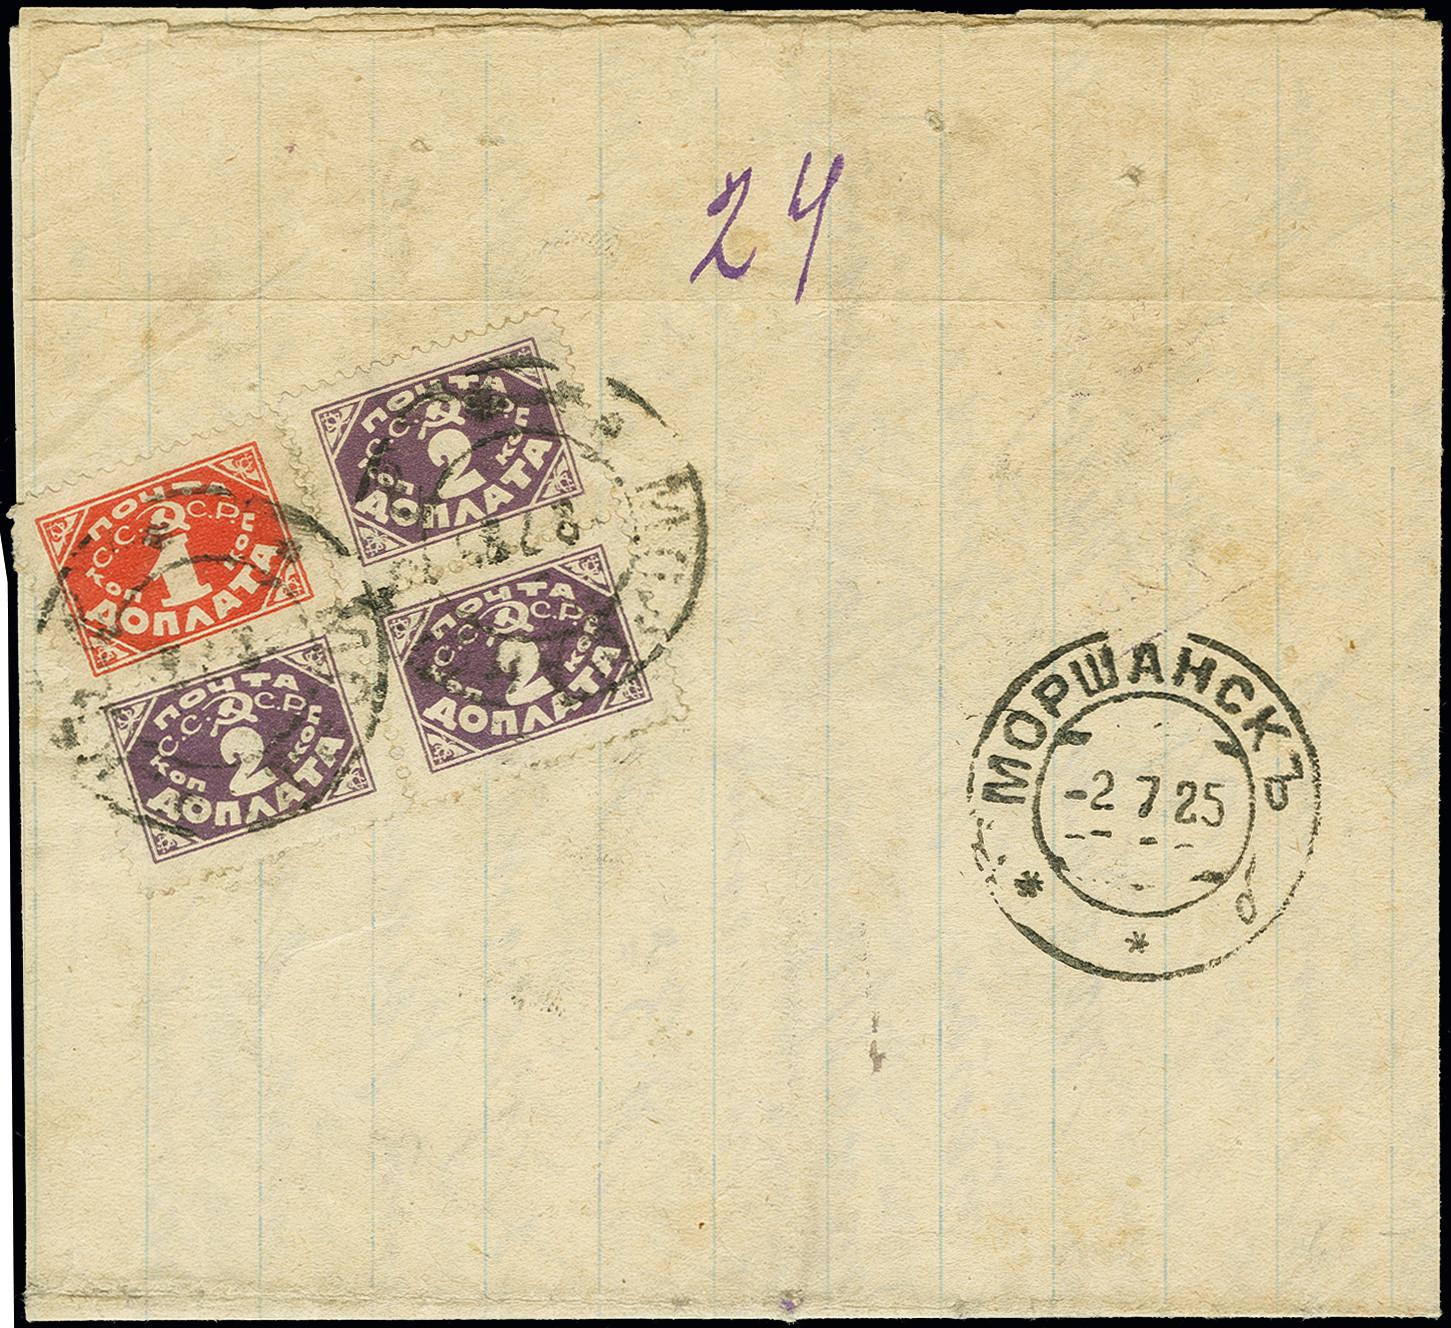 Lot 715 - levant Sovjet Union - Postage due -  Heinrich Koehler Auktionen Auction #368- Day 1